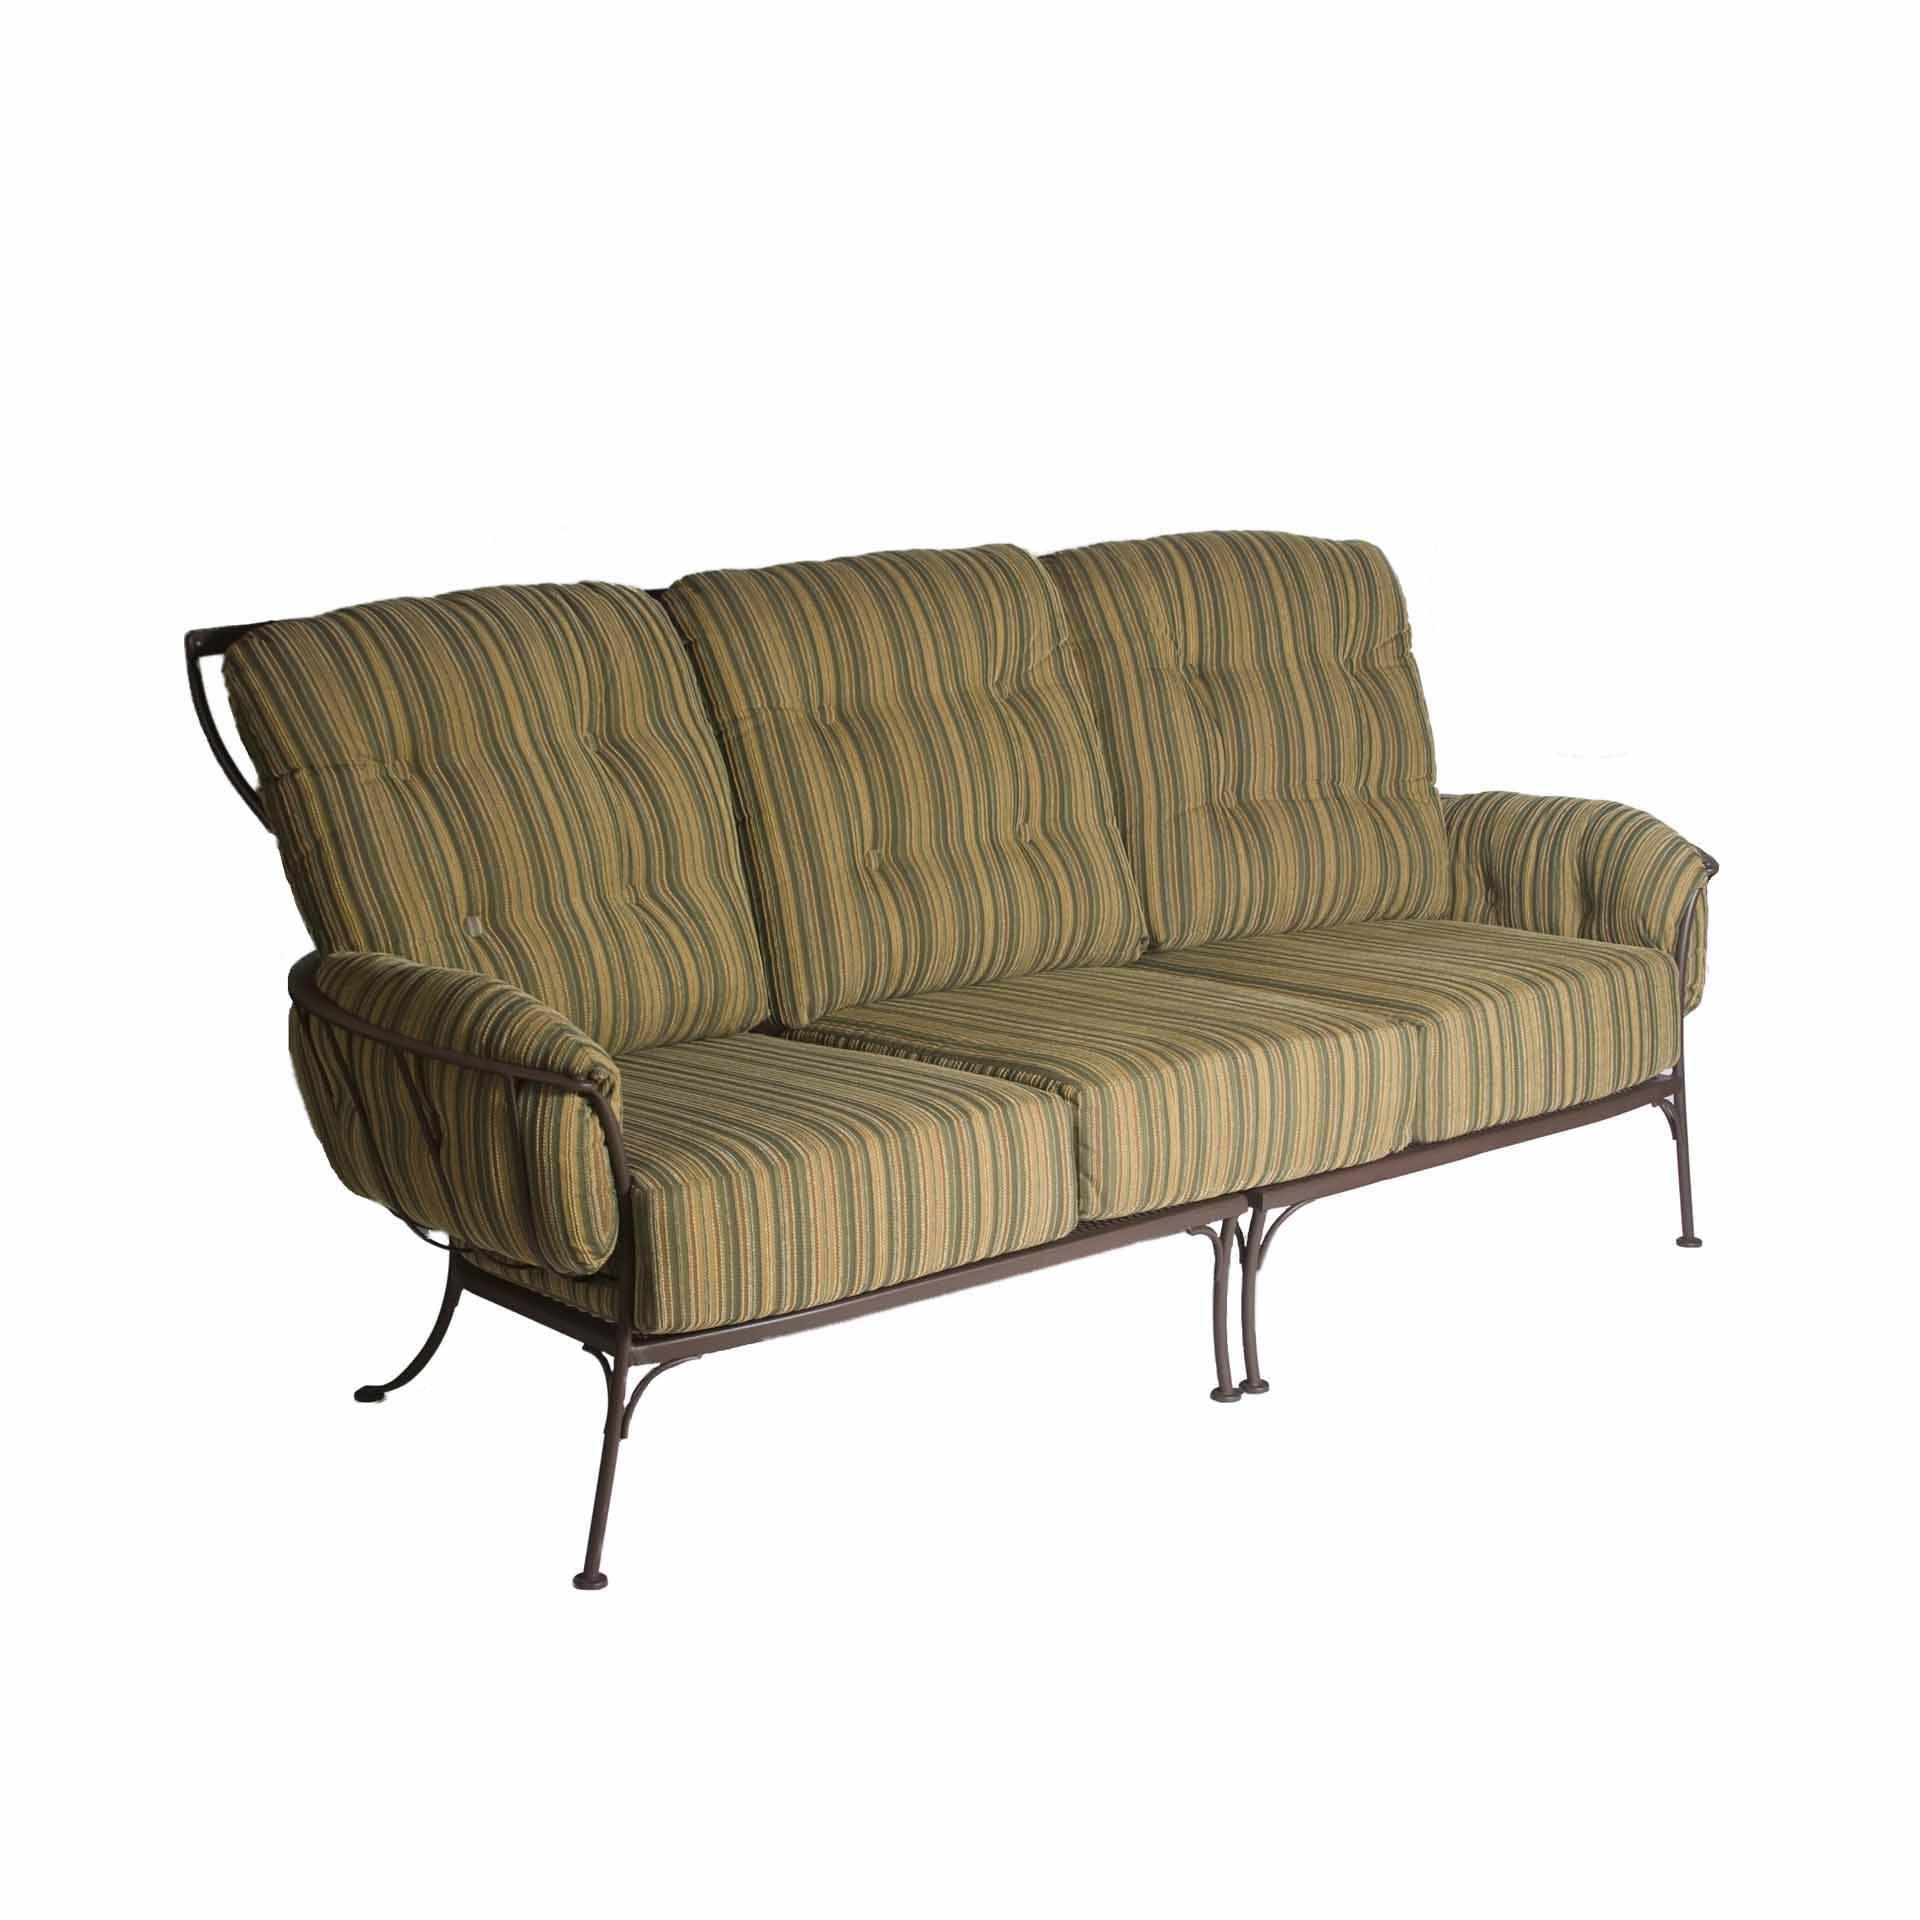 Ow Lee Monterra Three Seat Sofa Leisure Living